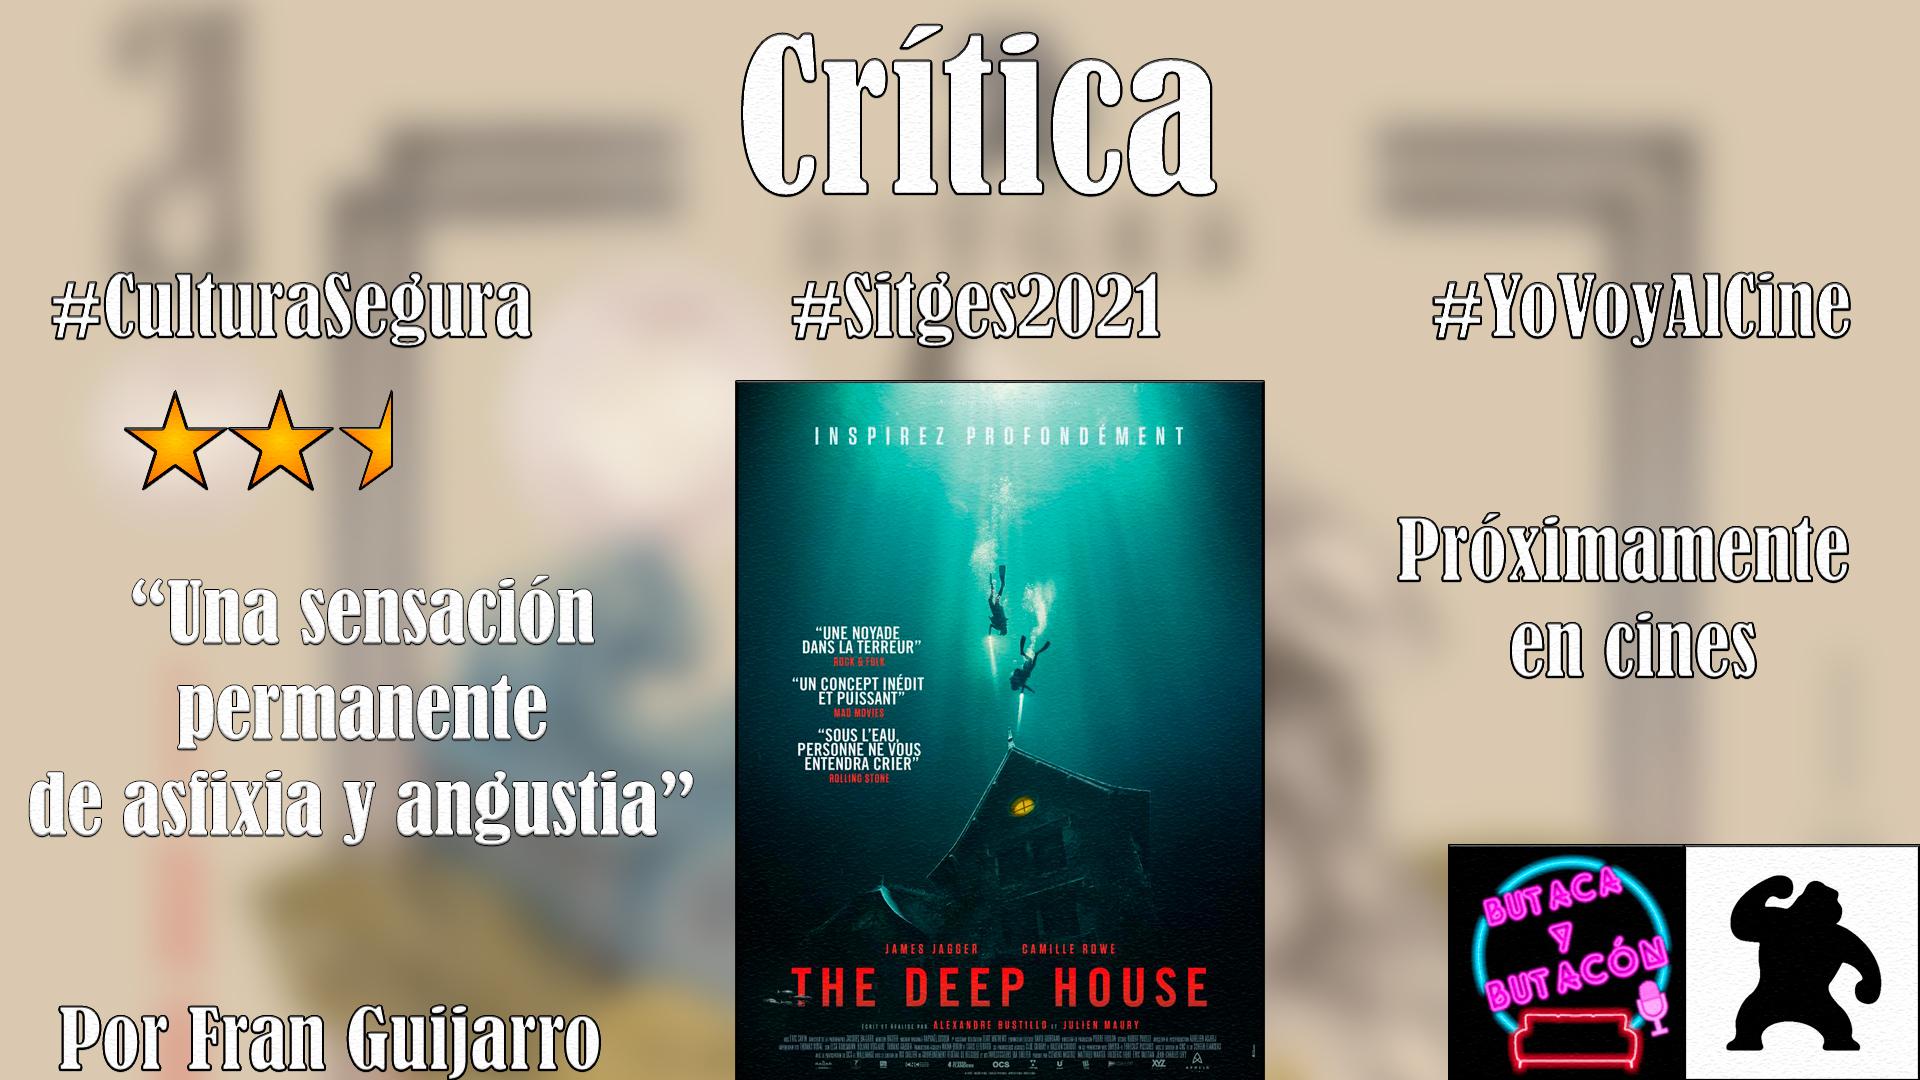 'The Deep House': asfixia y angustia bajo las profundidades marinas